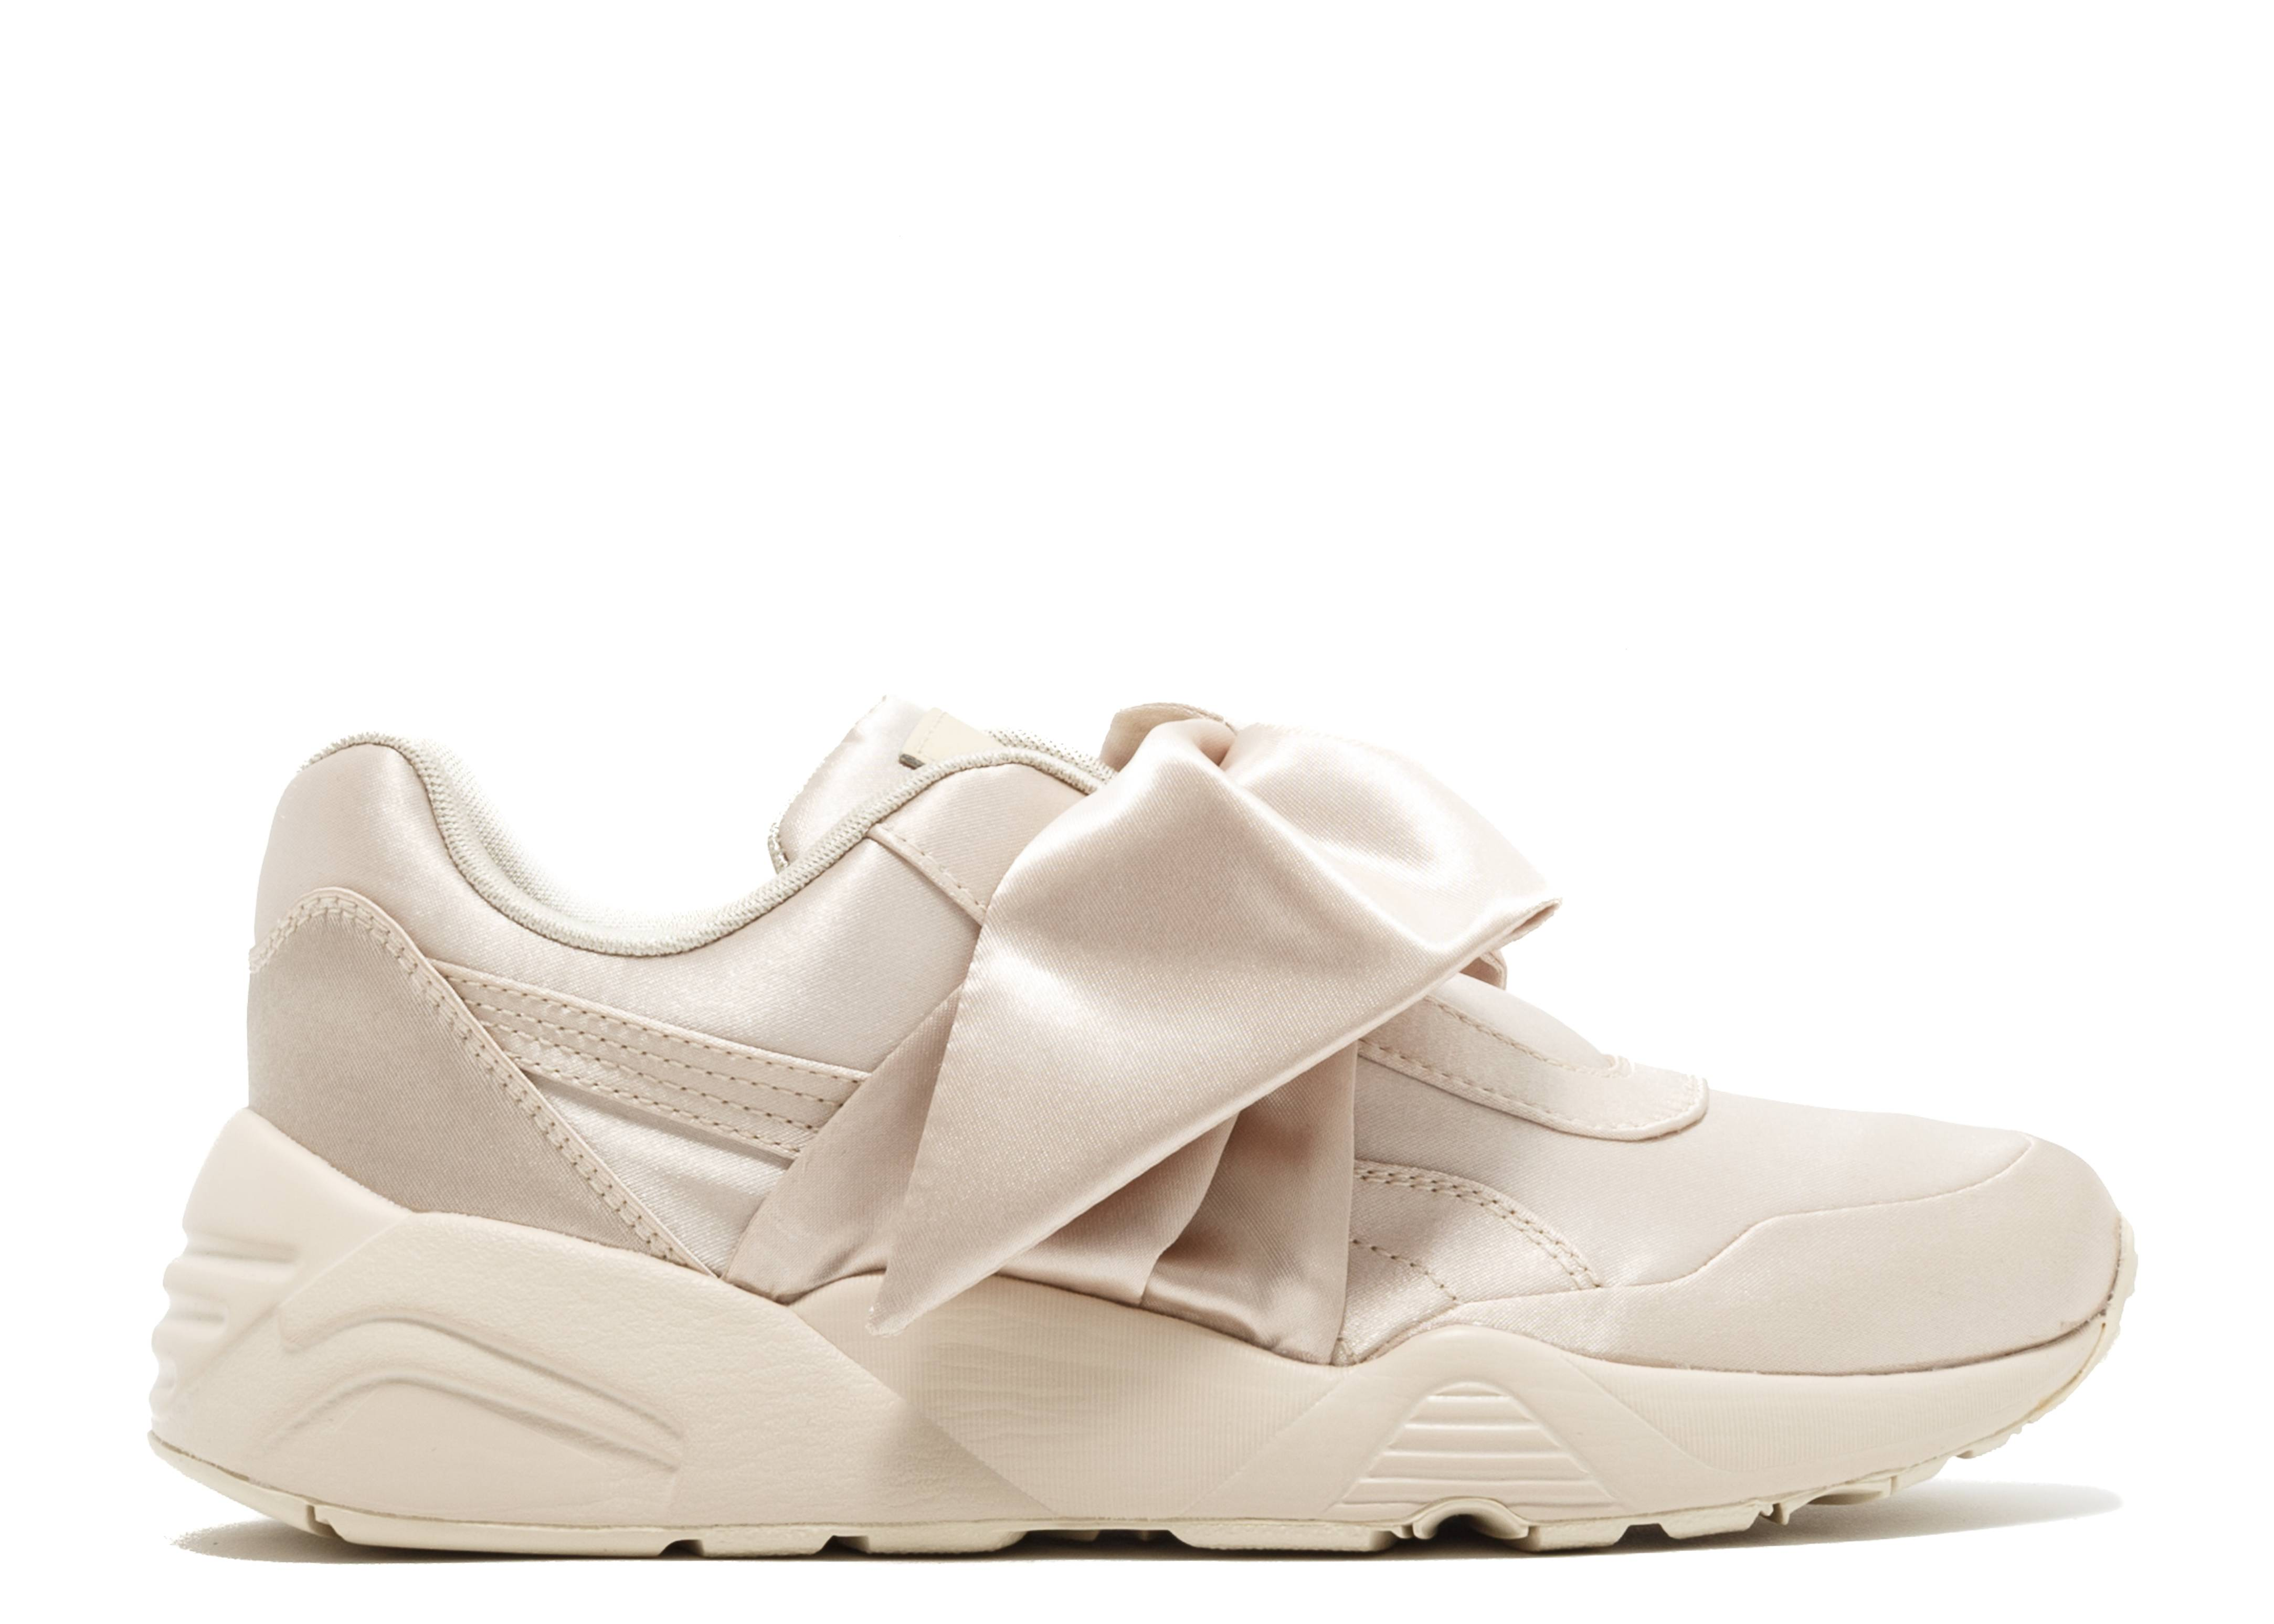 "RIHANNA X PUMA FENTY BOW TRINOMIC ""RIHANNA X PUMA FENTY BOW Sneakers"""